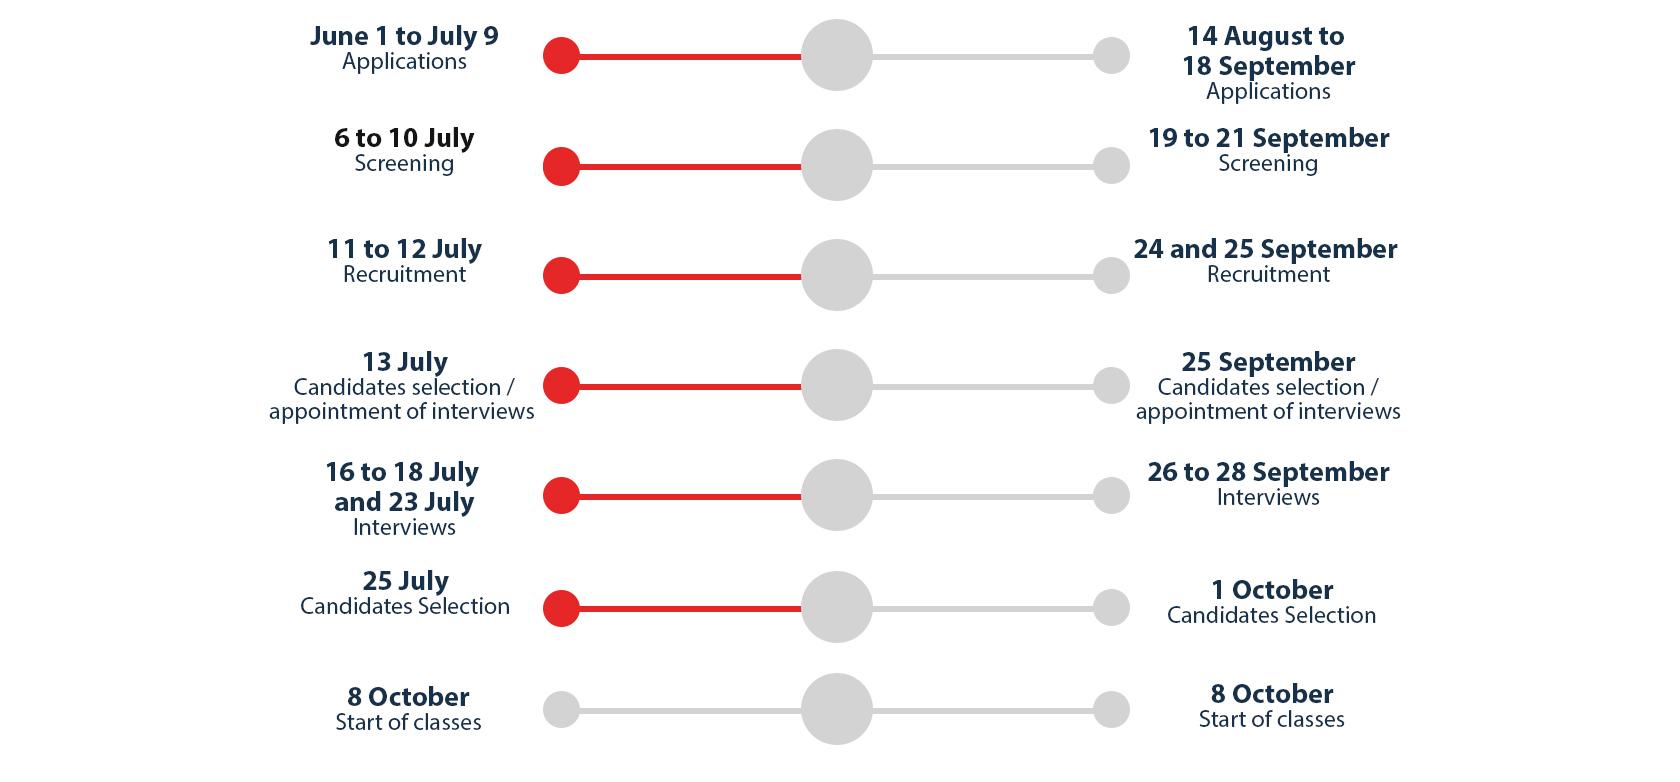 Applications Timeline